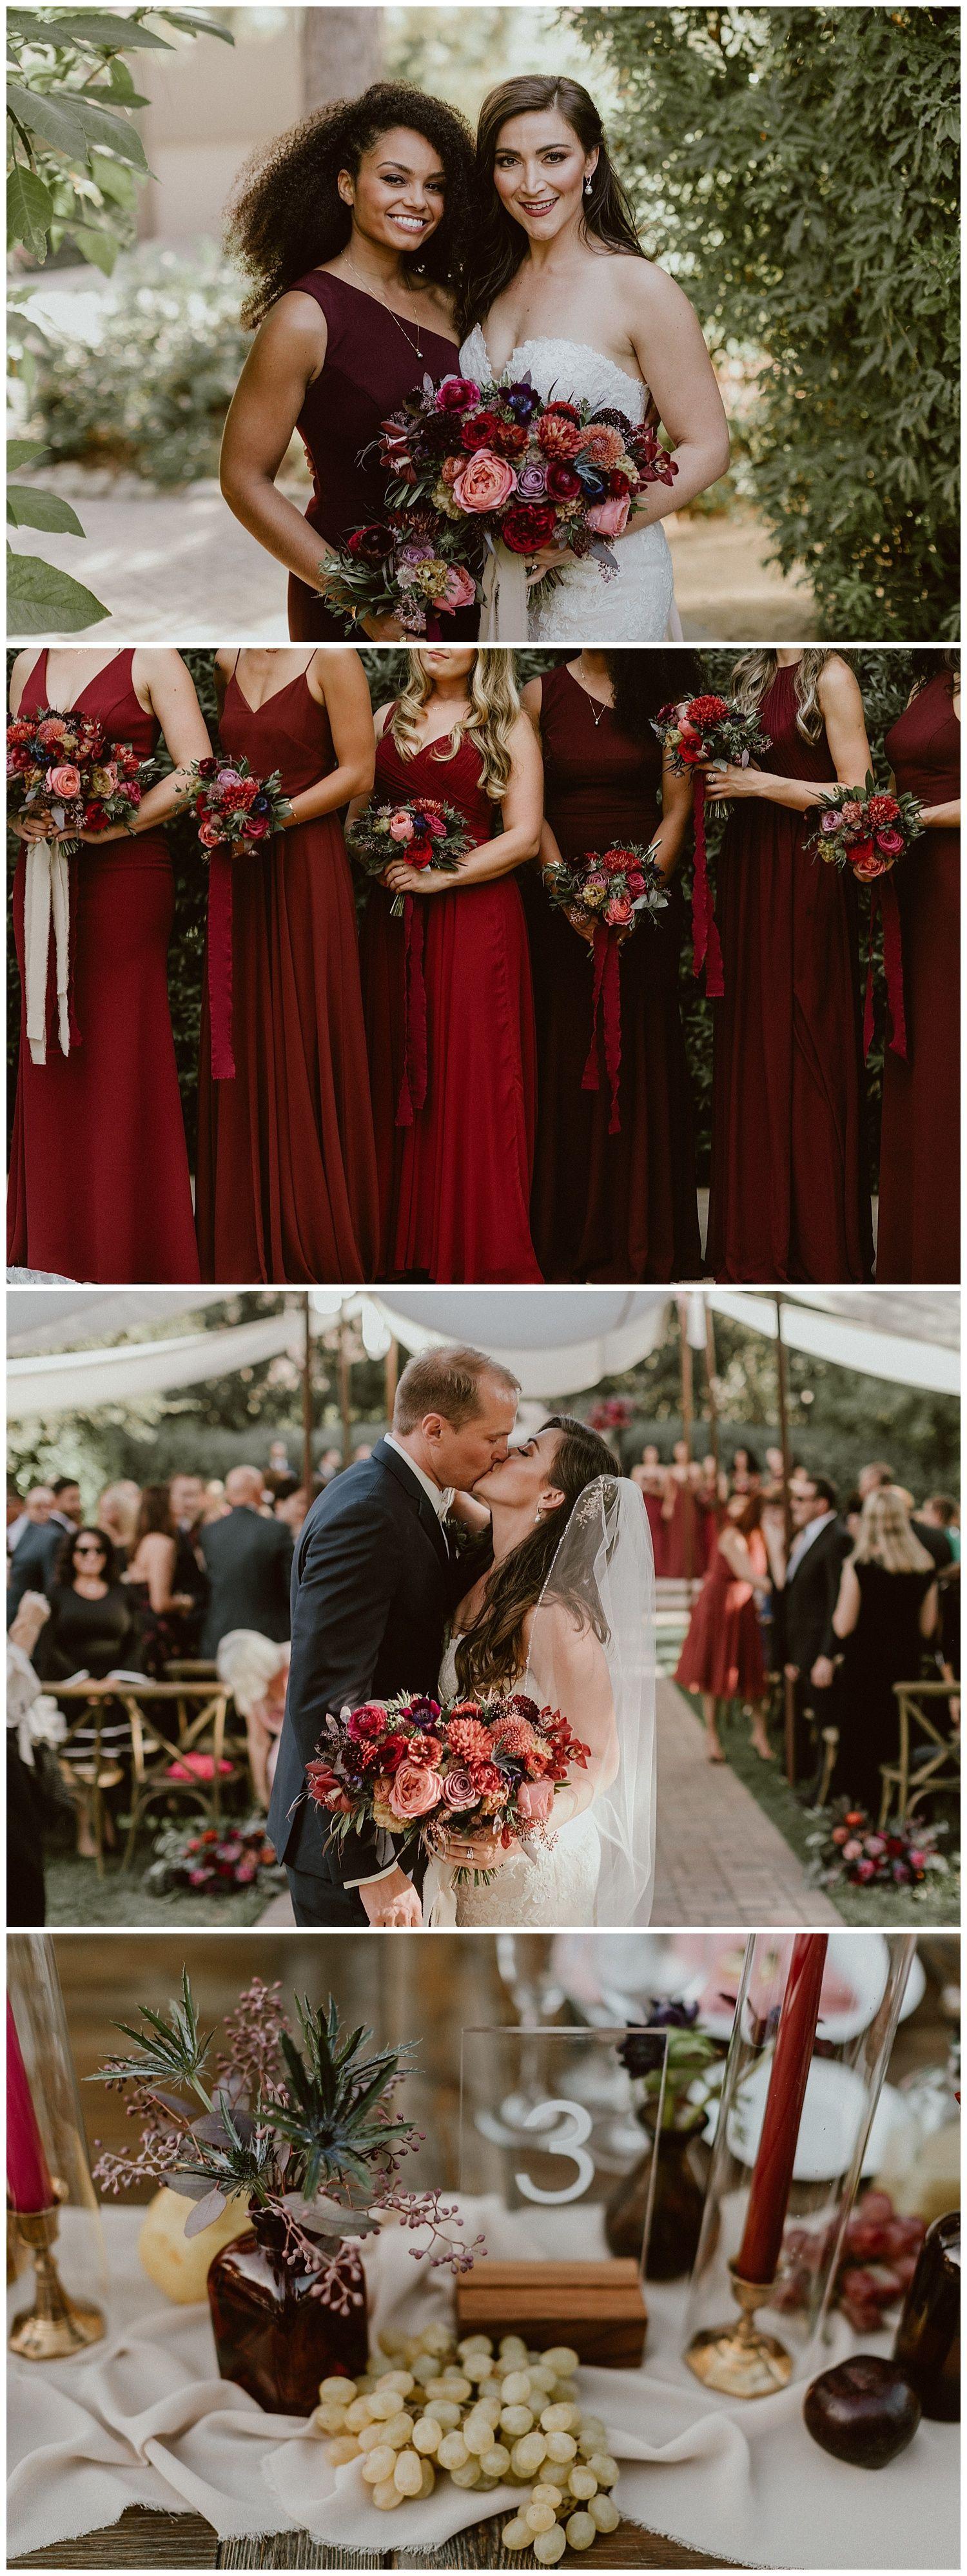 Wine Merlot And Burgundy Wedding Inspiration Fall Flowers Bridesmaids Dresses Romantic Moody In 2020 Wine Red Wedding Green And Burgundy Wedding Wedding Colors